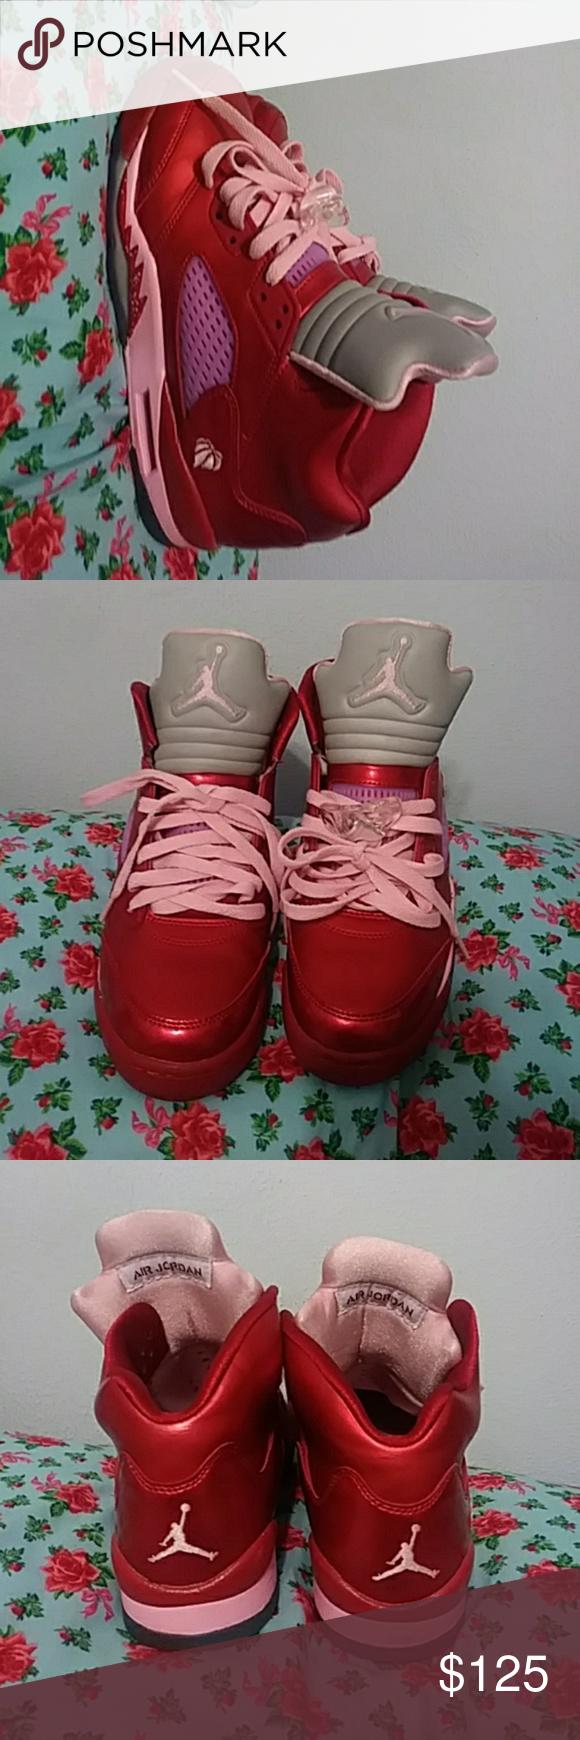 Nike Air Jordan Retro 5 Valentine S Day 100 Authentic Mens Size 6 5